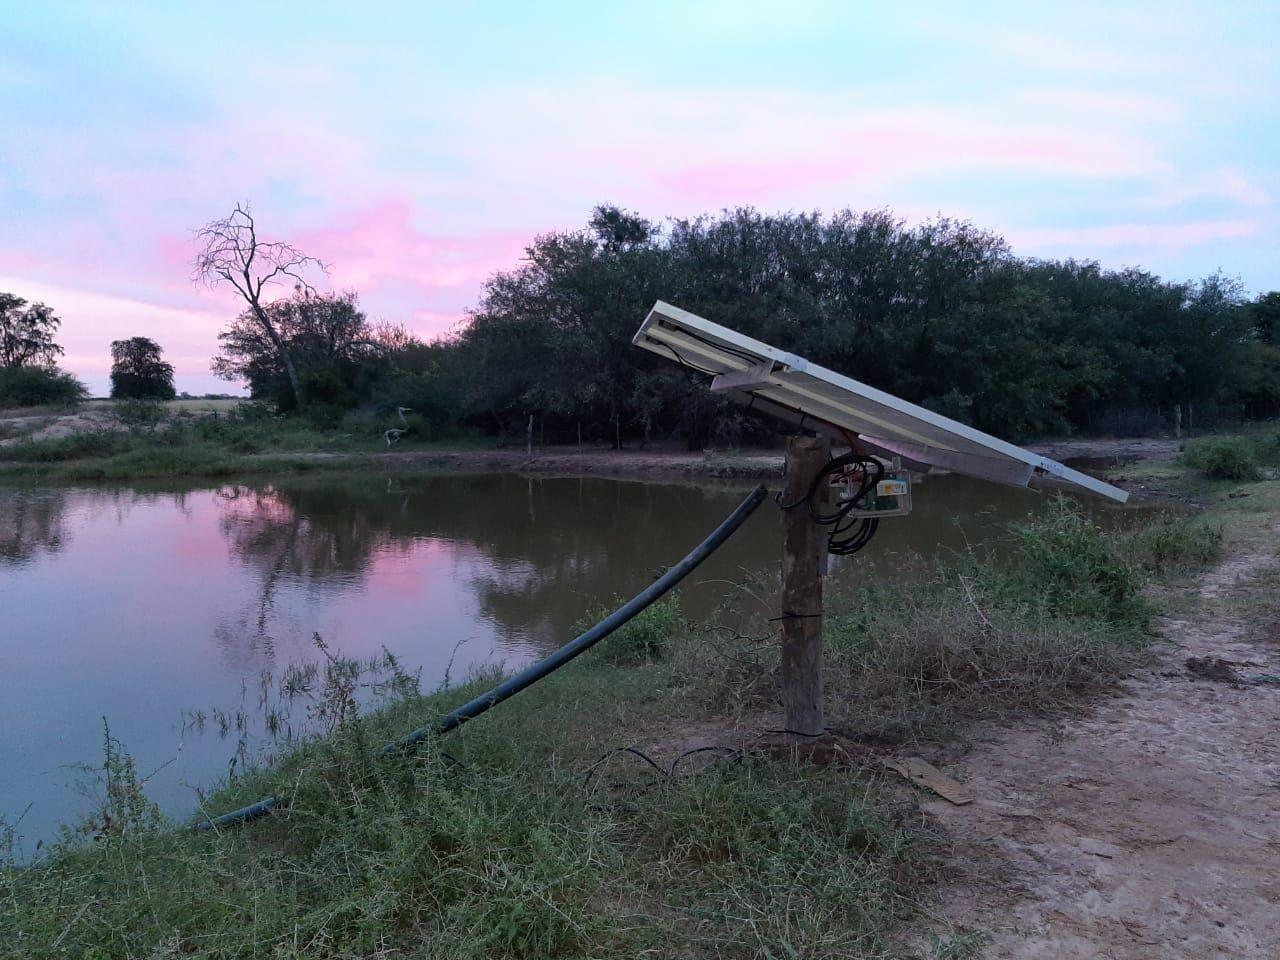 Paraguay, January 2019